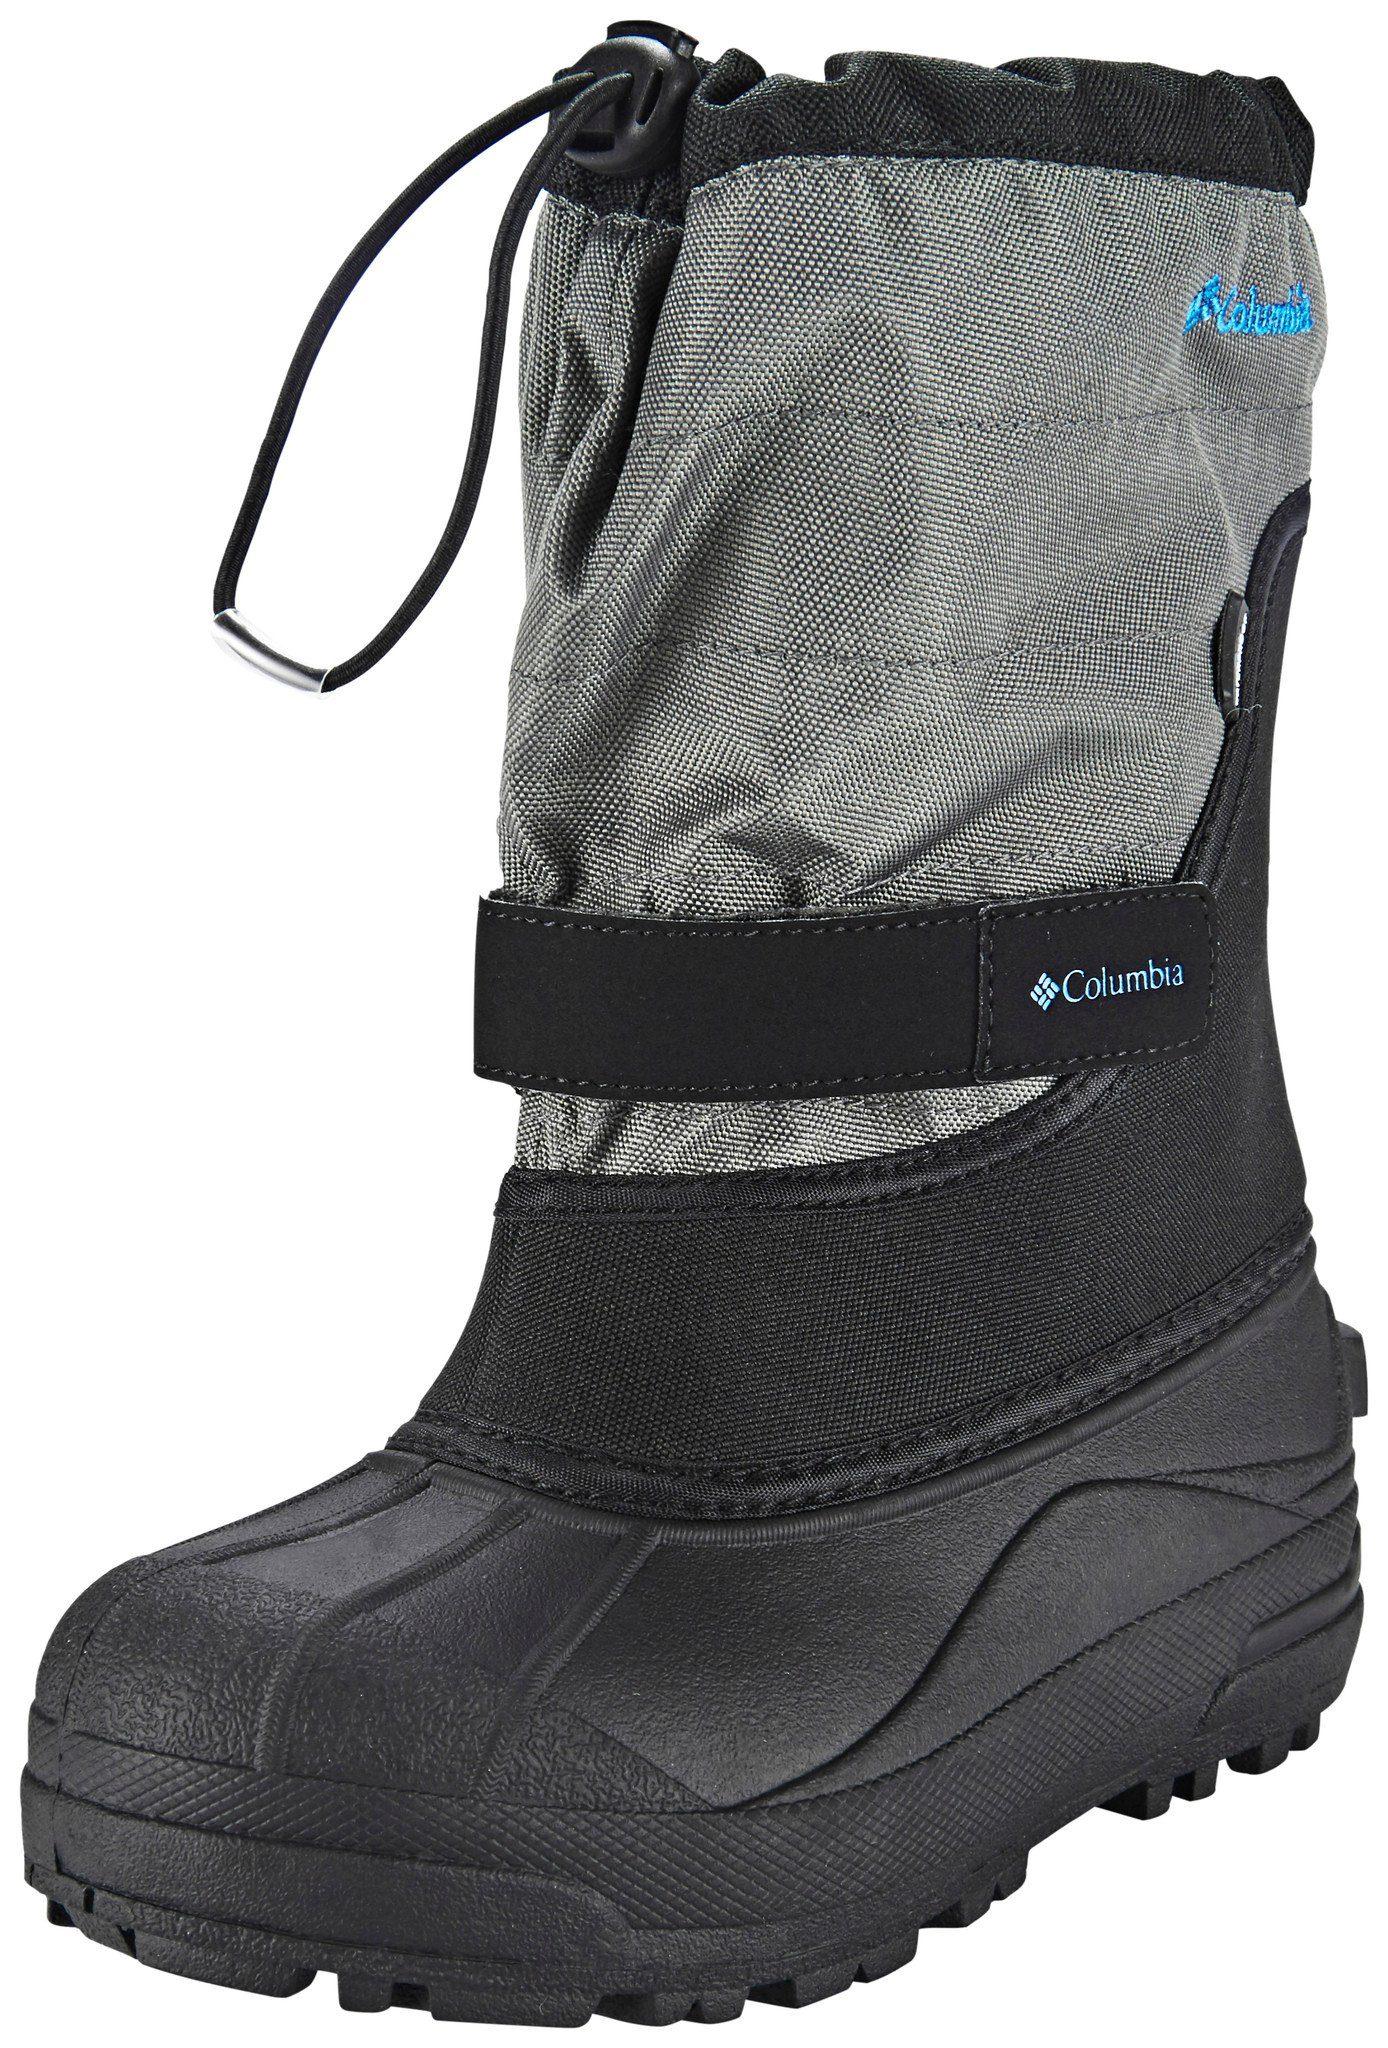 Columbia Stiefel »Columbia Powderbug Plus II Boots Youth«